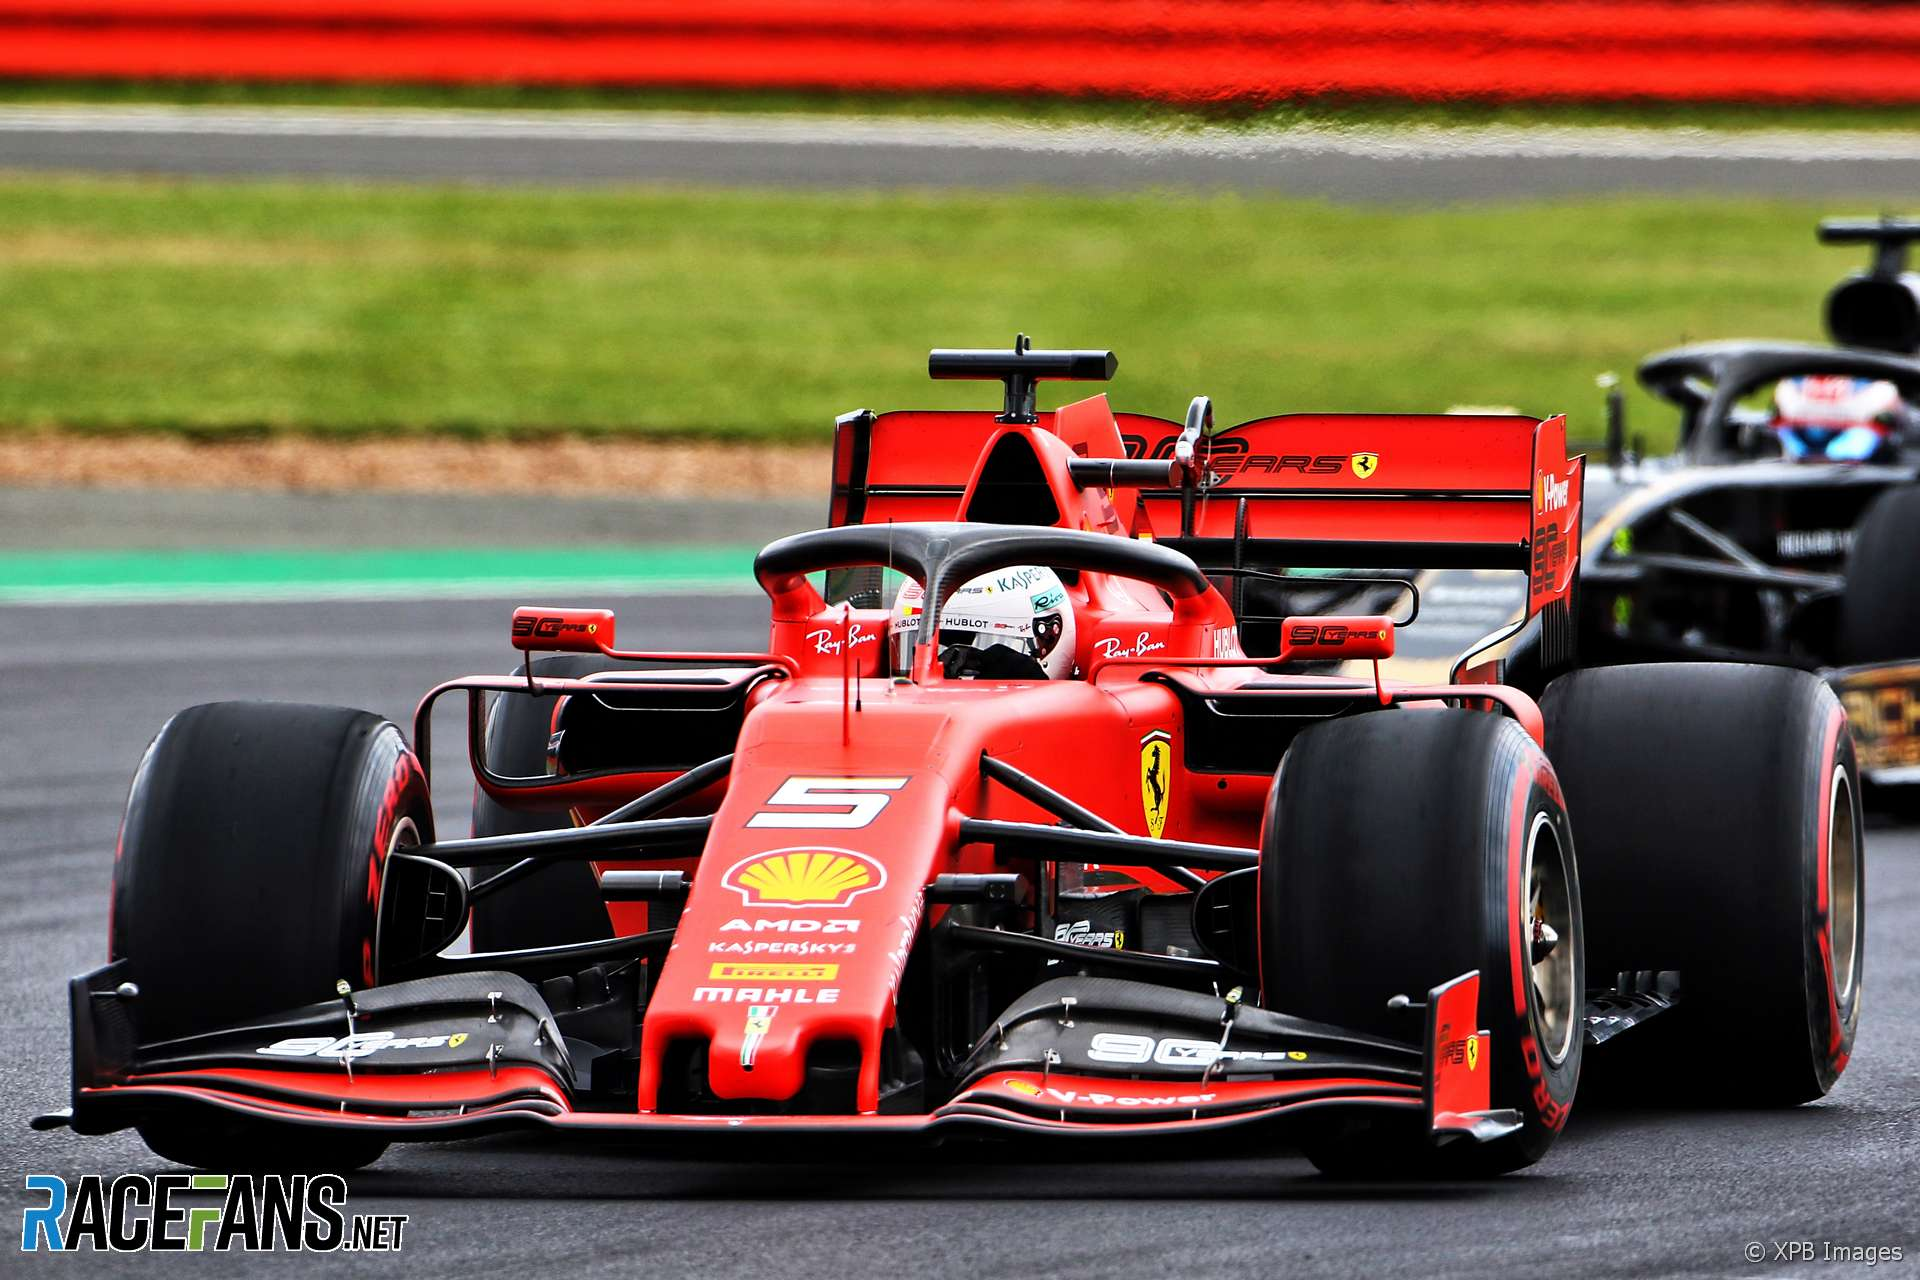 Sebastian Vettel, Ferrari, Silverstone, 2019